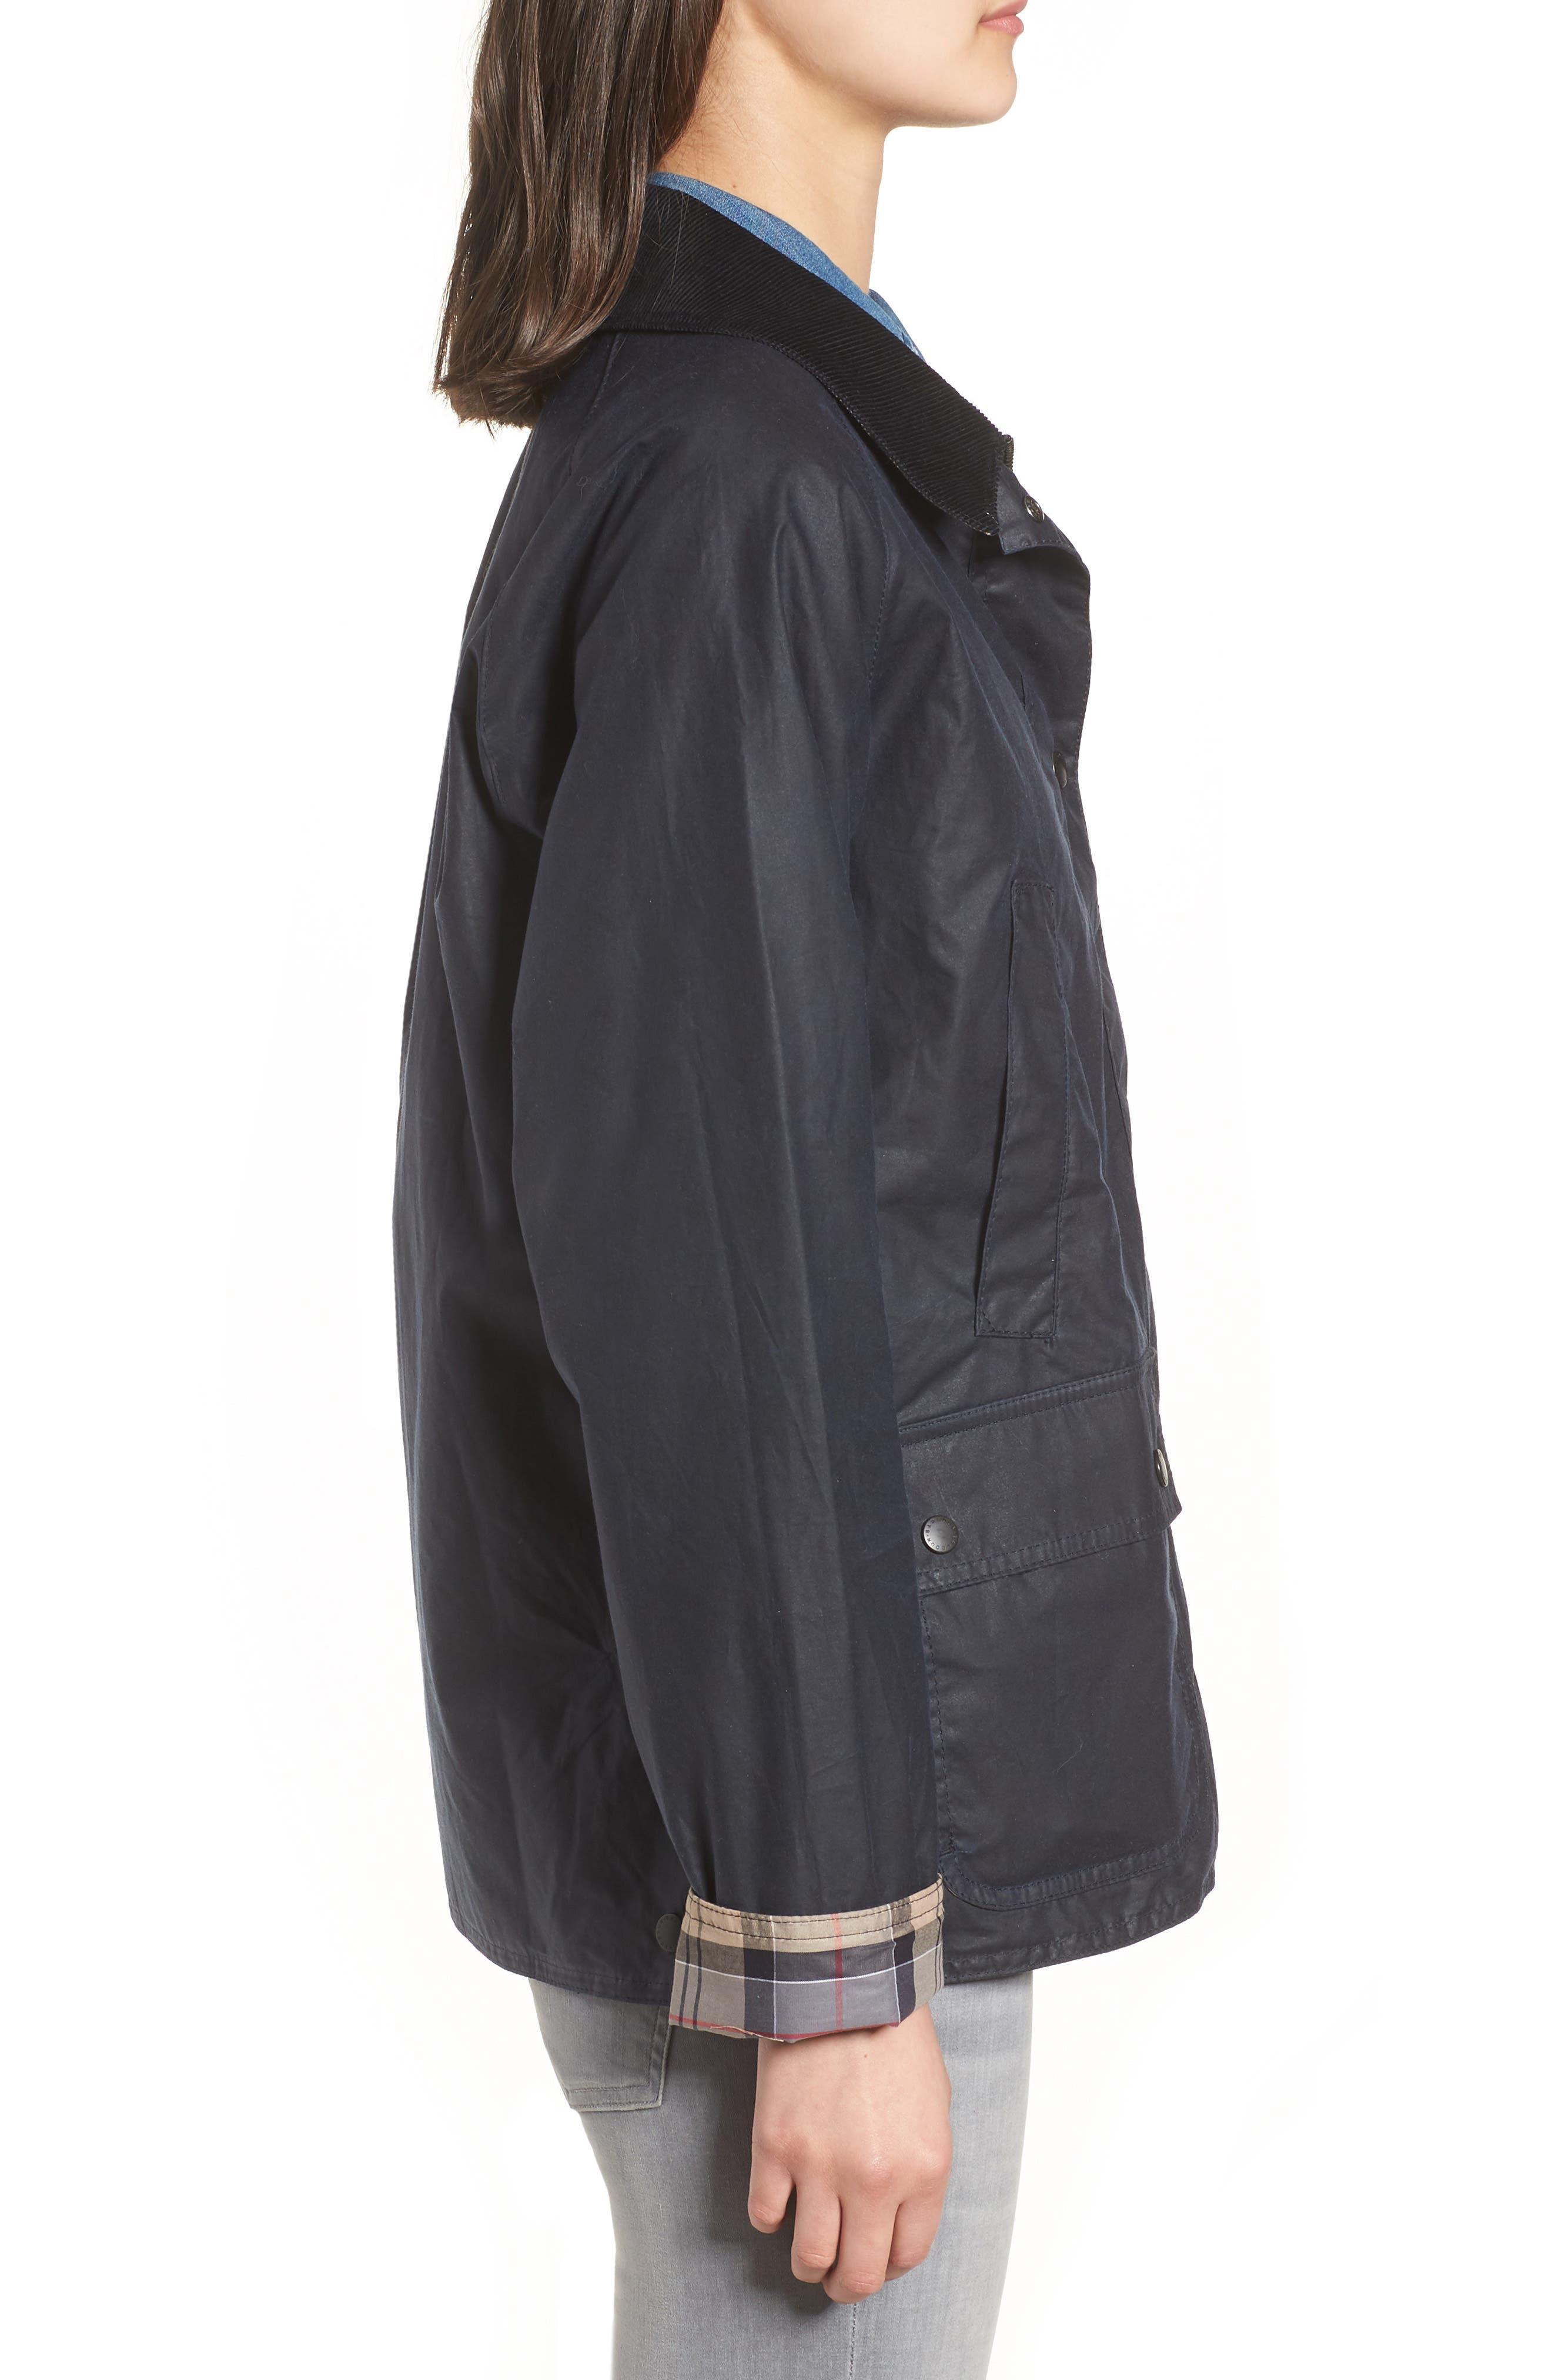 Acorn Water Resistant Waxed Cotton Jacket,                             Alternate thumbnail 4, color,                             Royal Navy